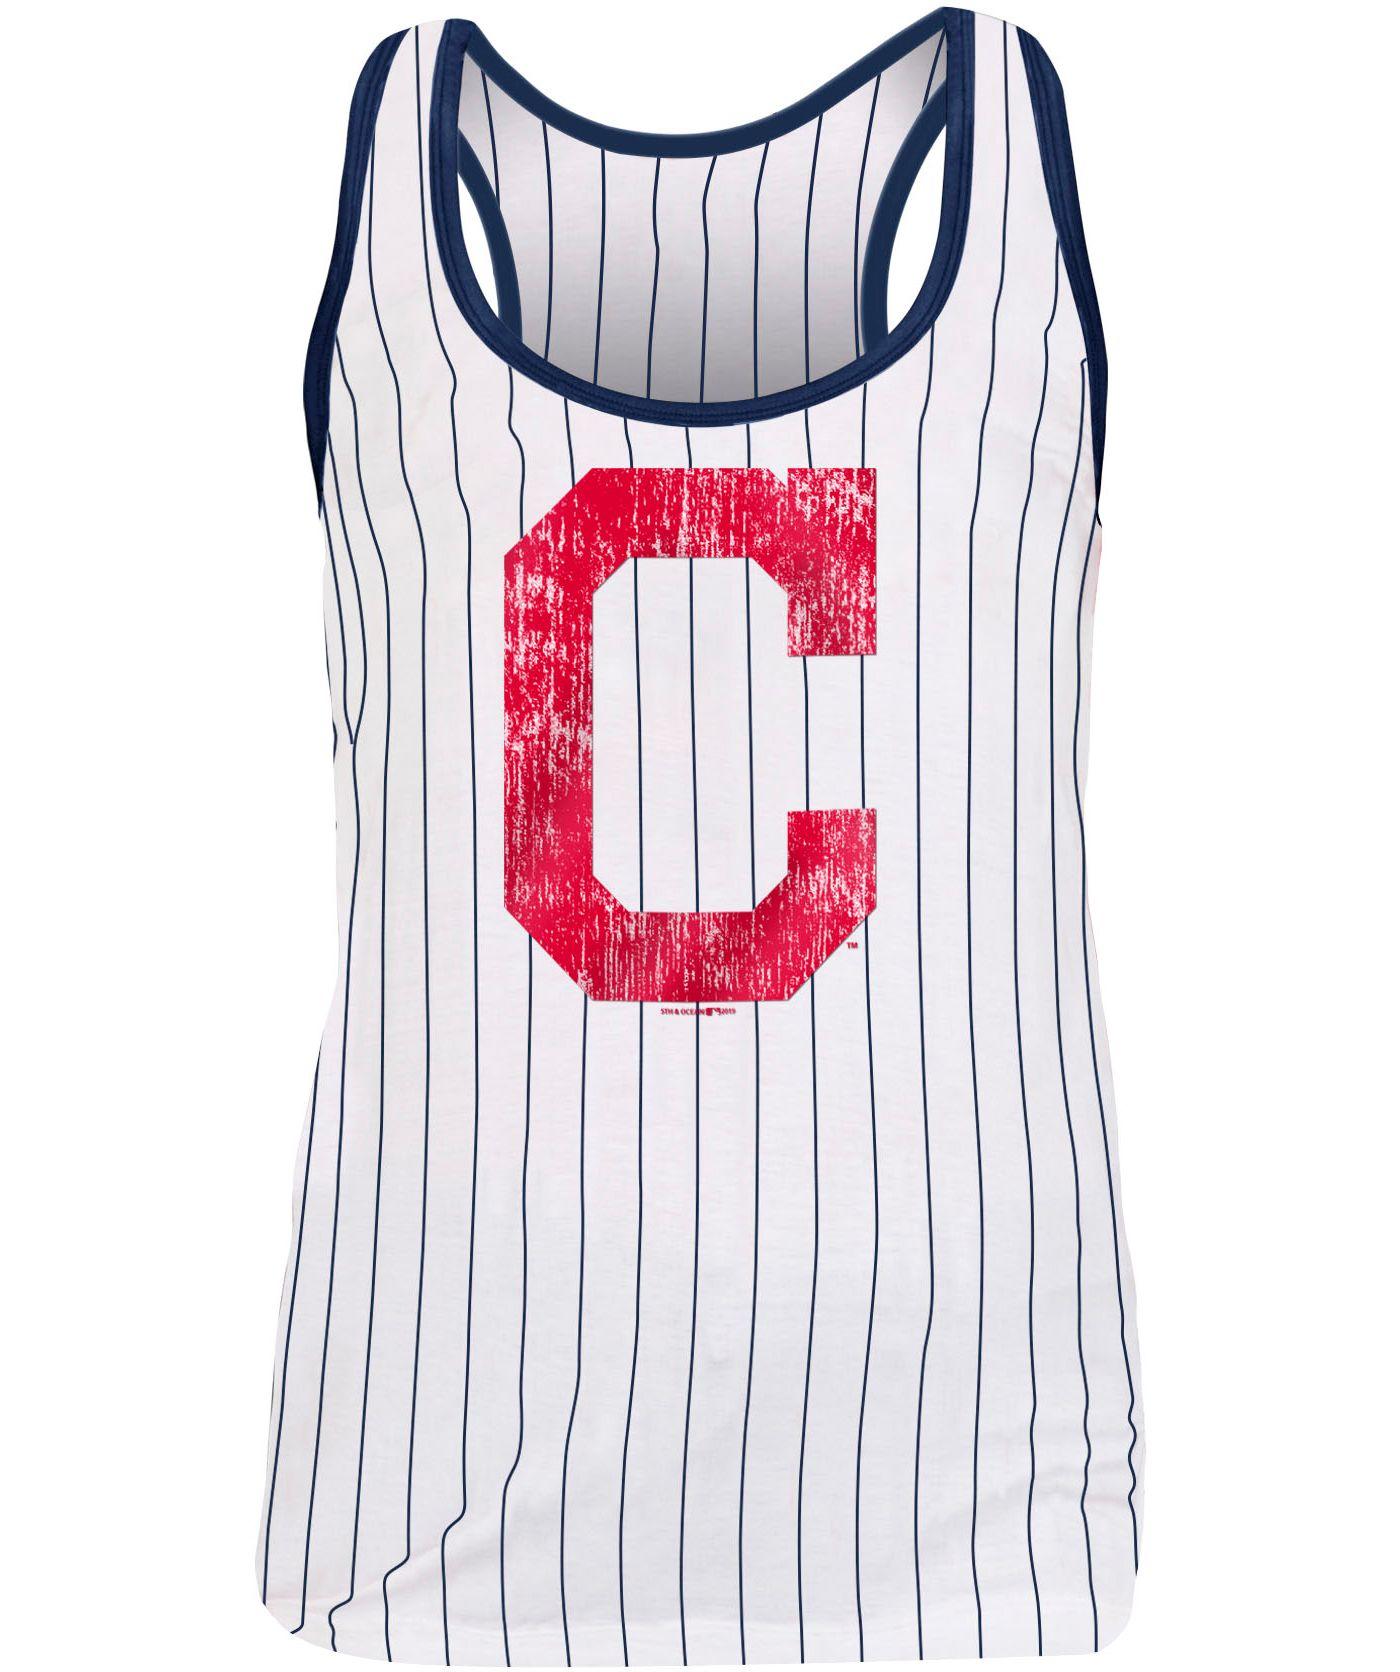 New Era Women's Cleveland Indians Pinstripe Tri-Blend Tank Top